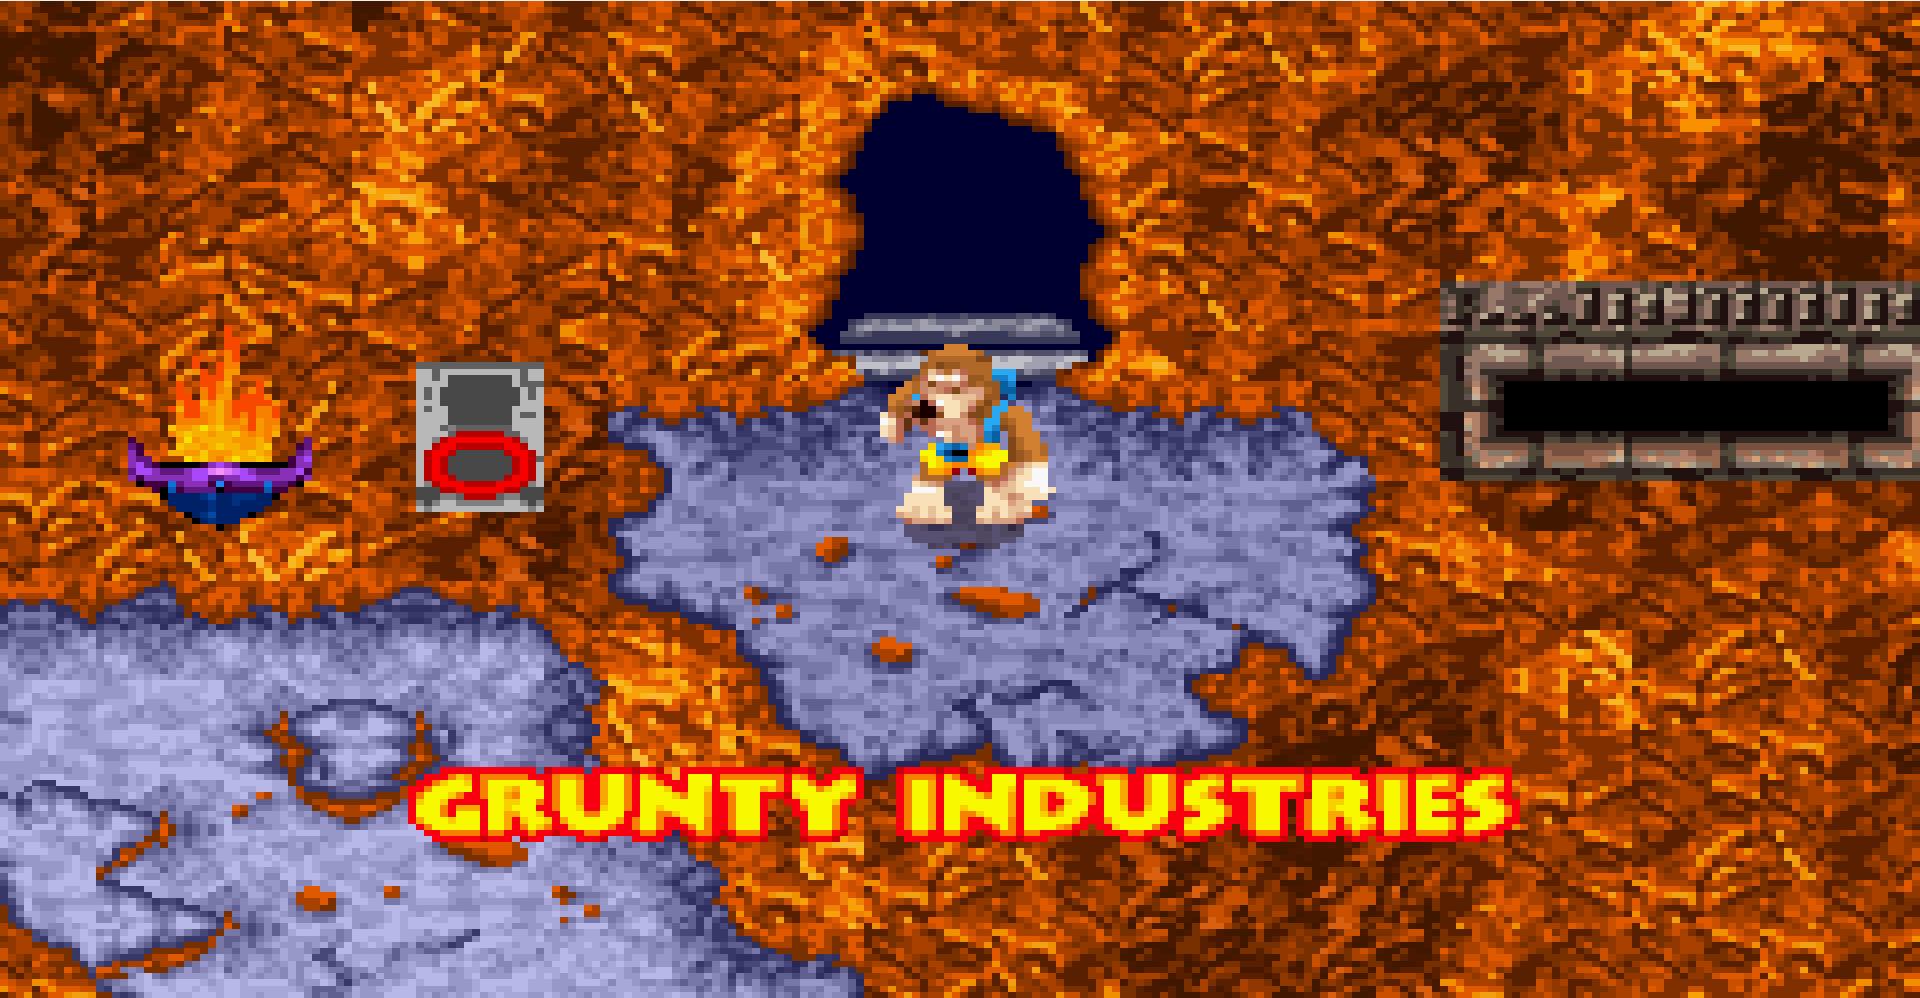 Grunty Industries (Grunty's Revenge)